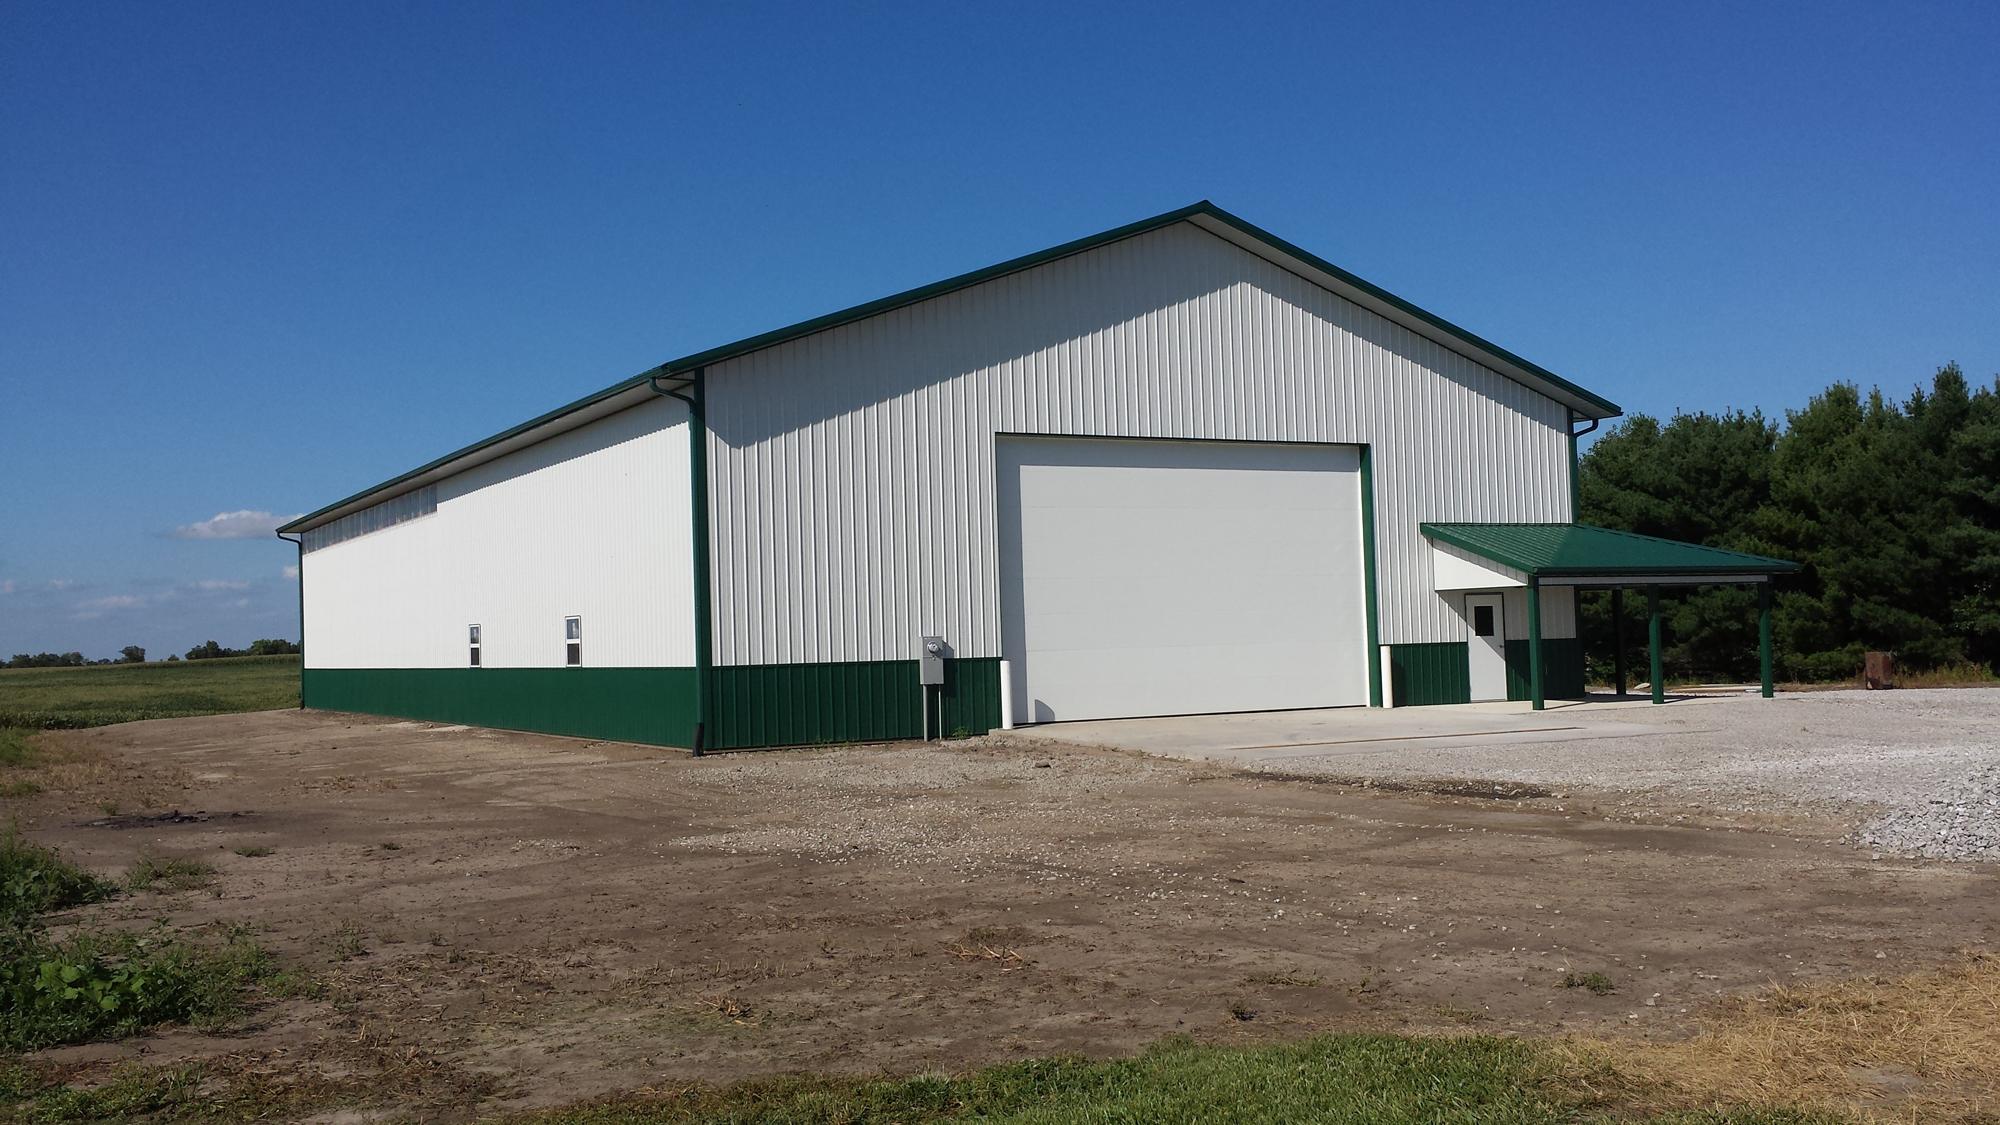 60 X 120 X 18 Ag Shop And Storage Building W 3